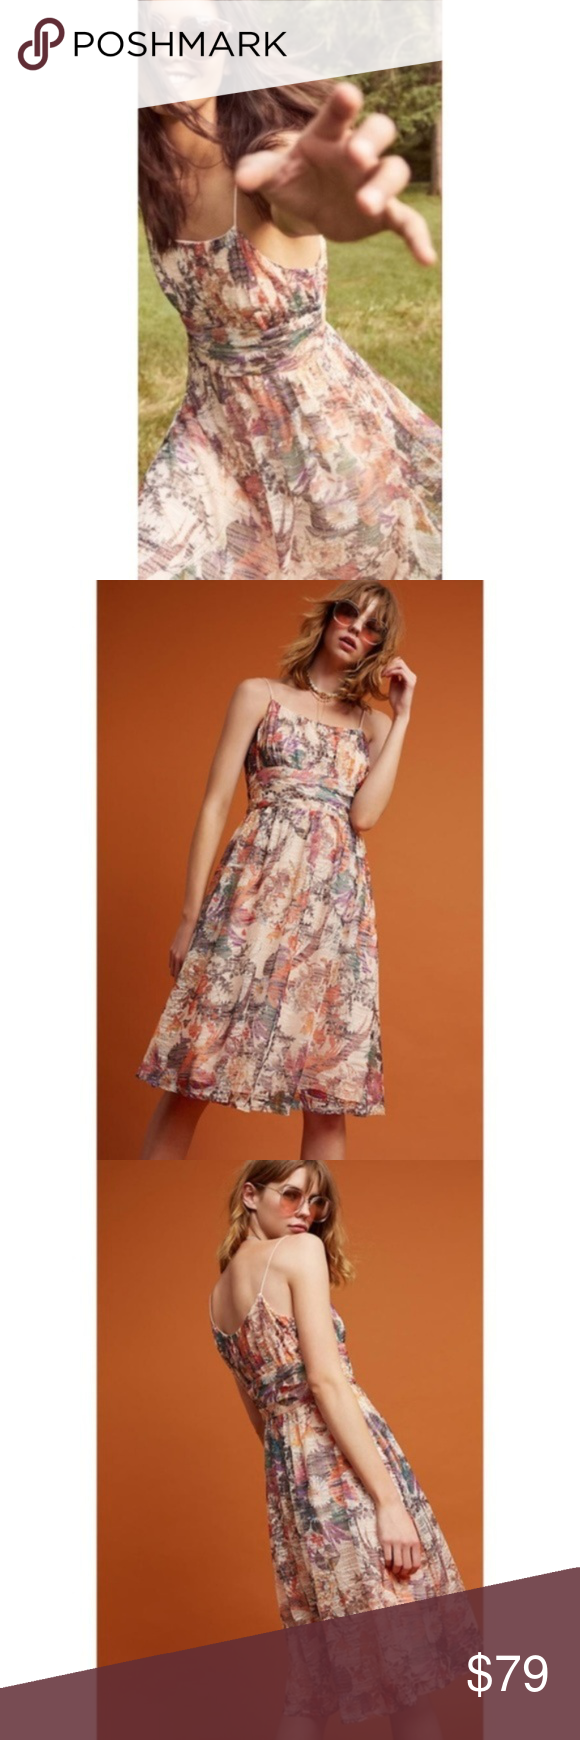 c5c2ca6a9ff2 NWT ANTHROPOLOGIE Maeve Mackenzie Floral Dress NWT | Turkey photos ...